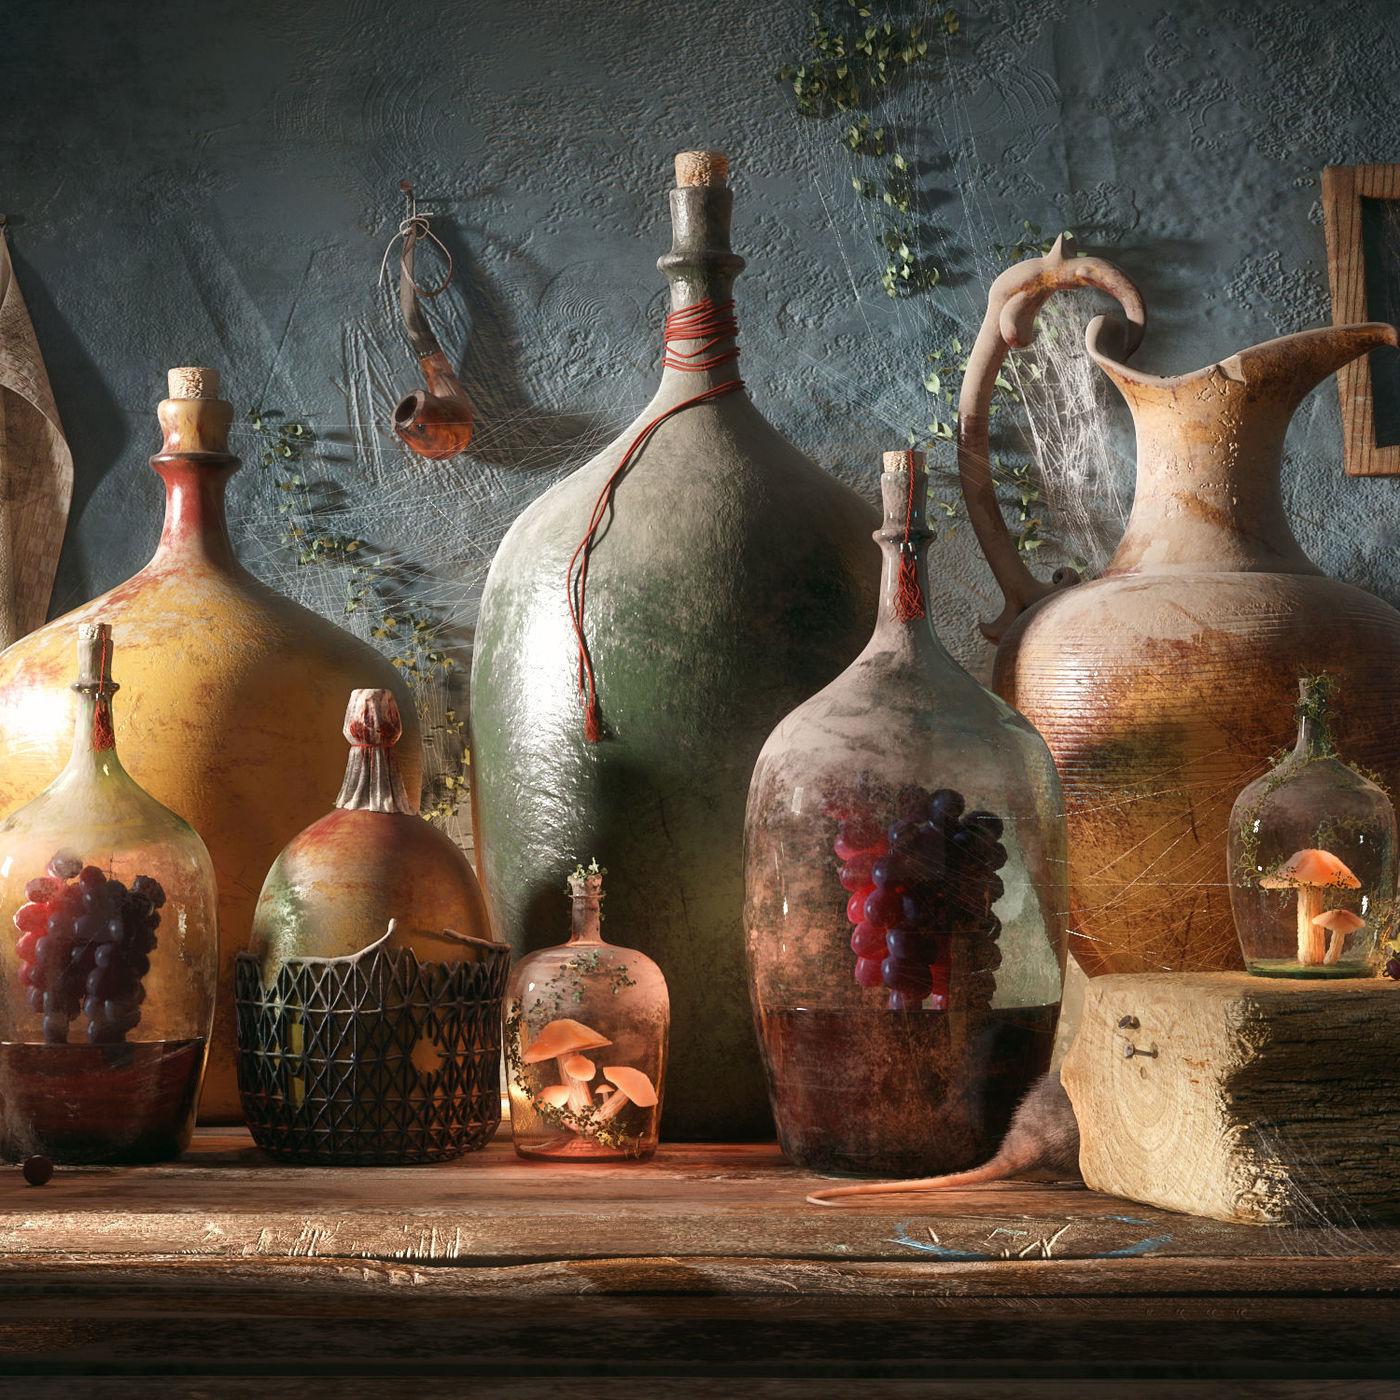 Bottles of Life by Farid Ghanbari